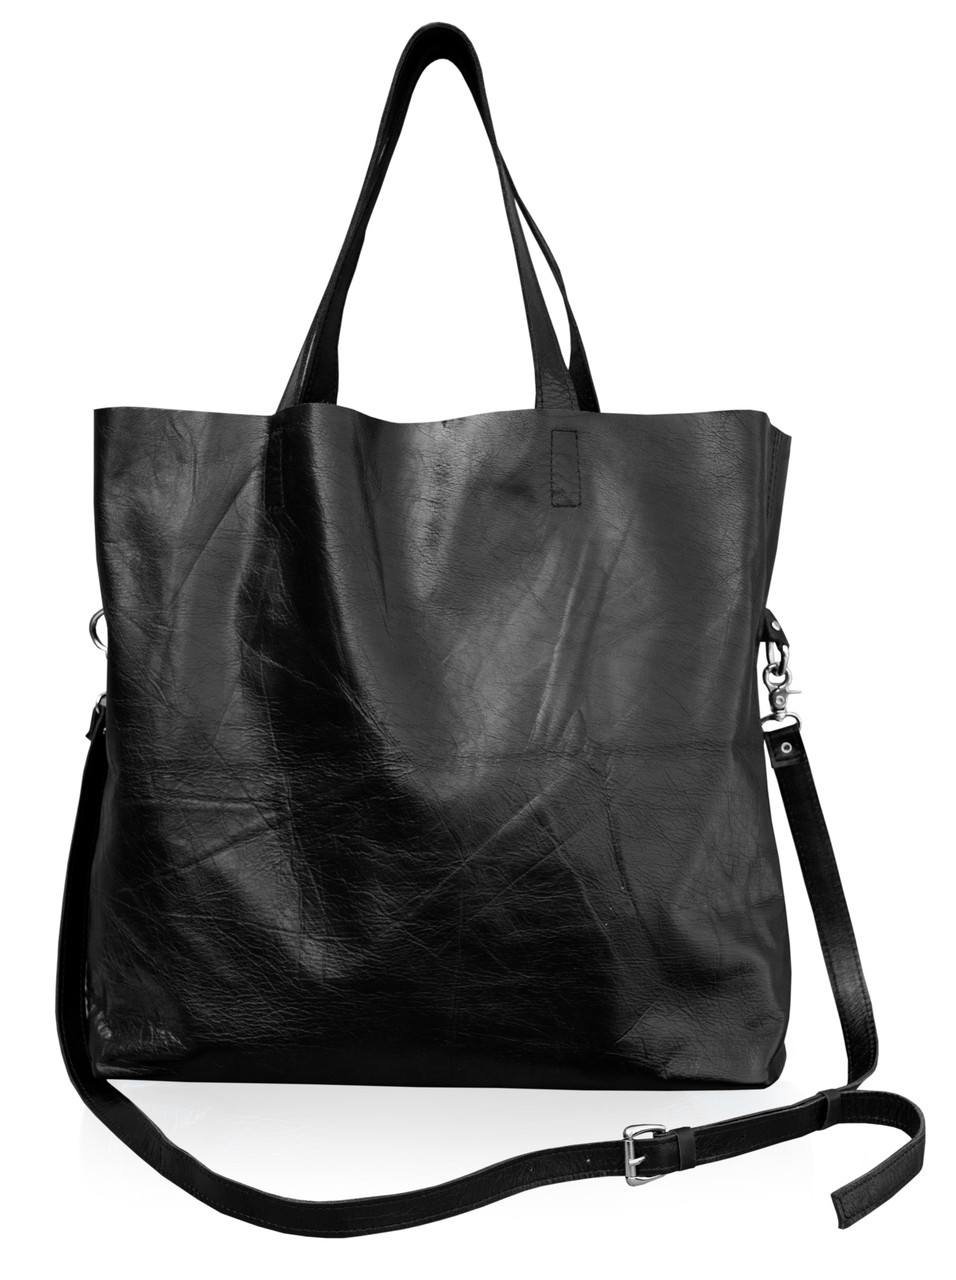 Shopper bag BlackMoon, сумка шопер, чёрная